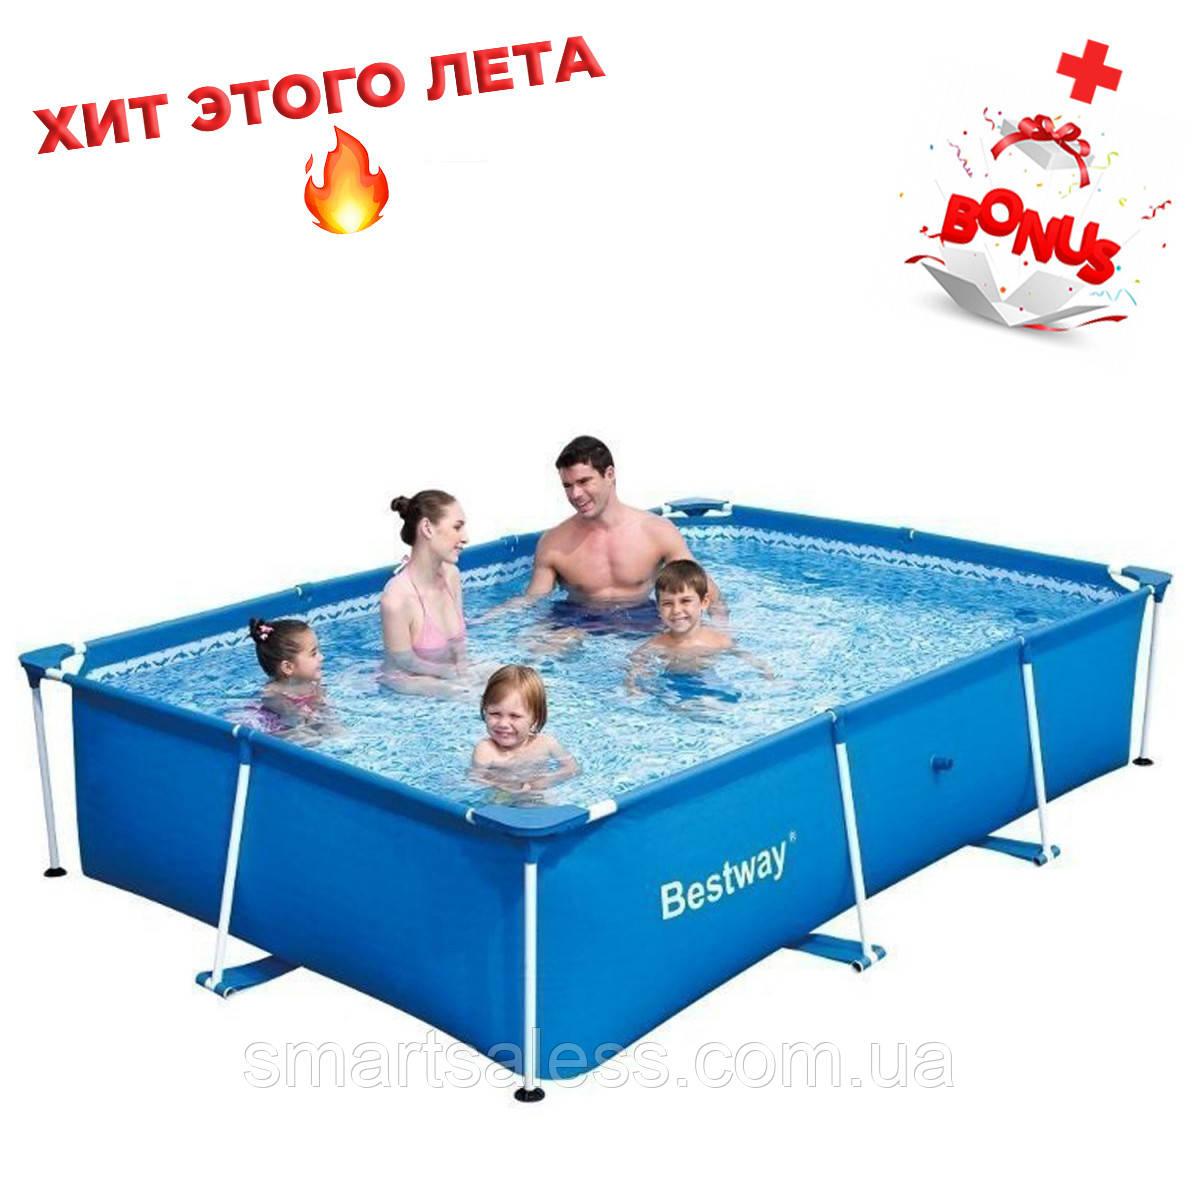 Каркасный бассейн Bestway, 259 х 170 х 61 см, детский, синий